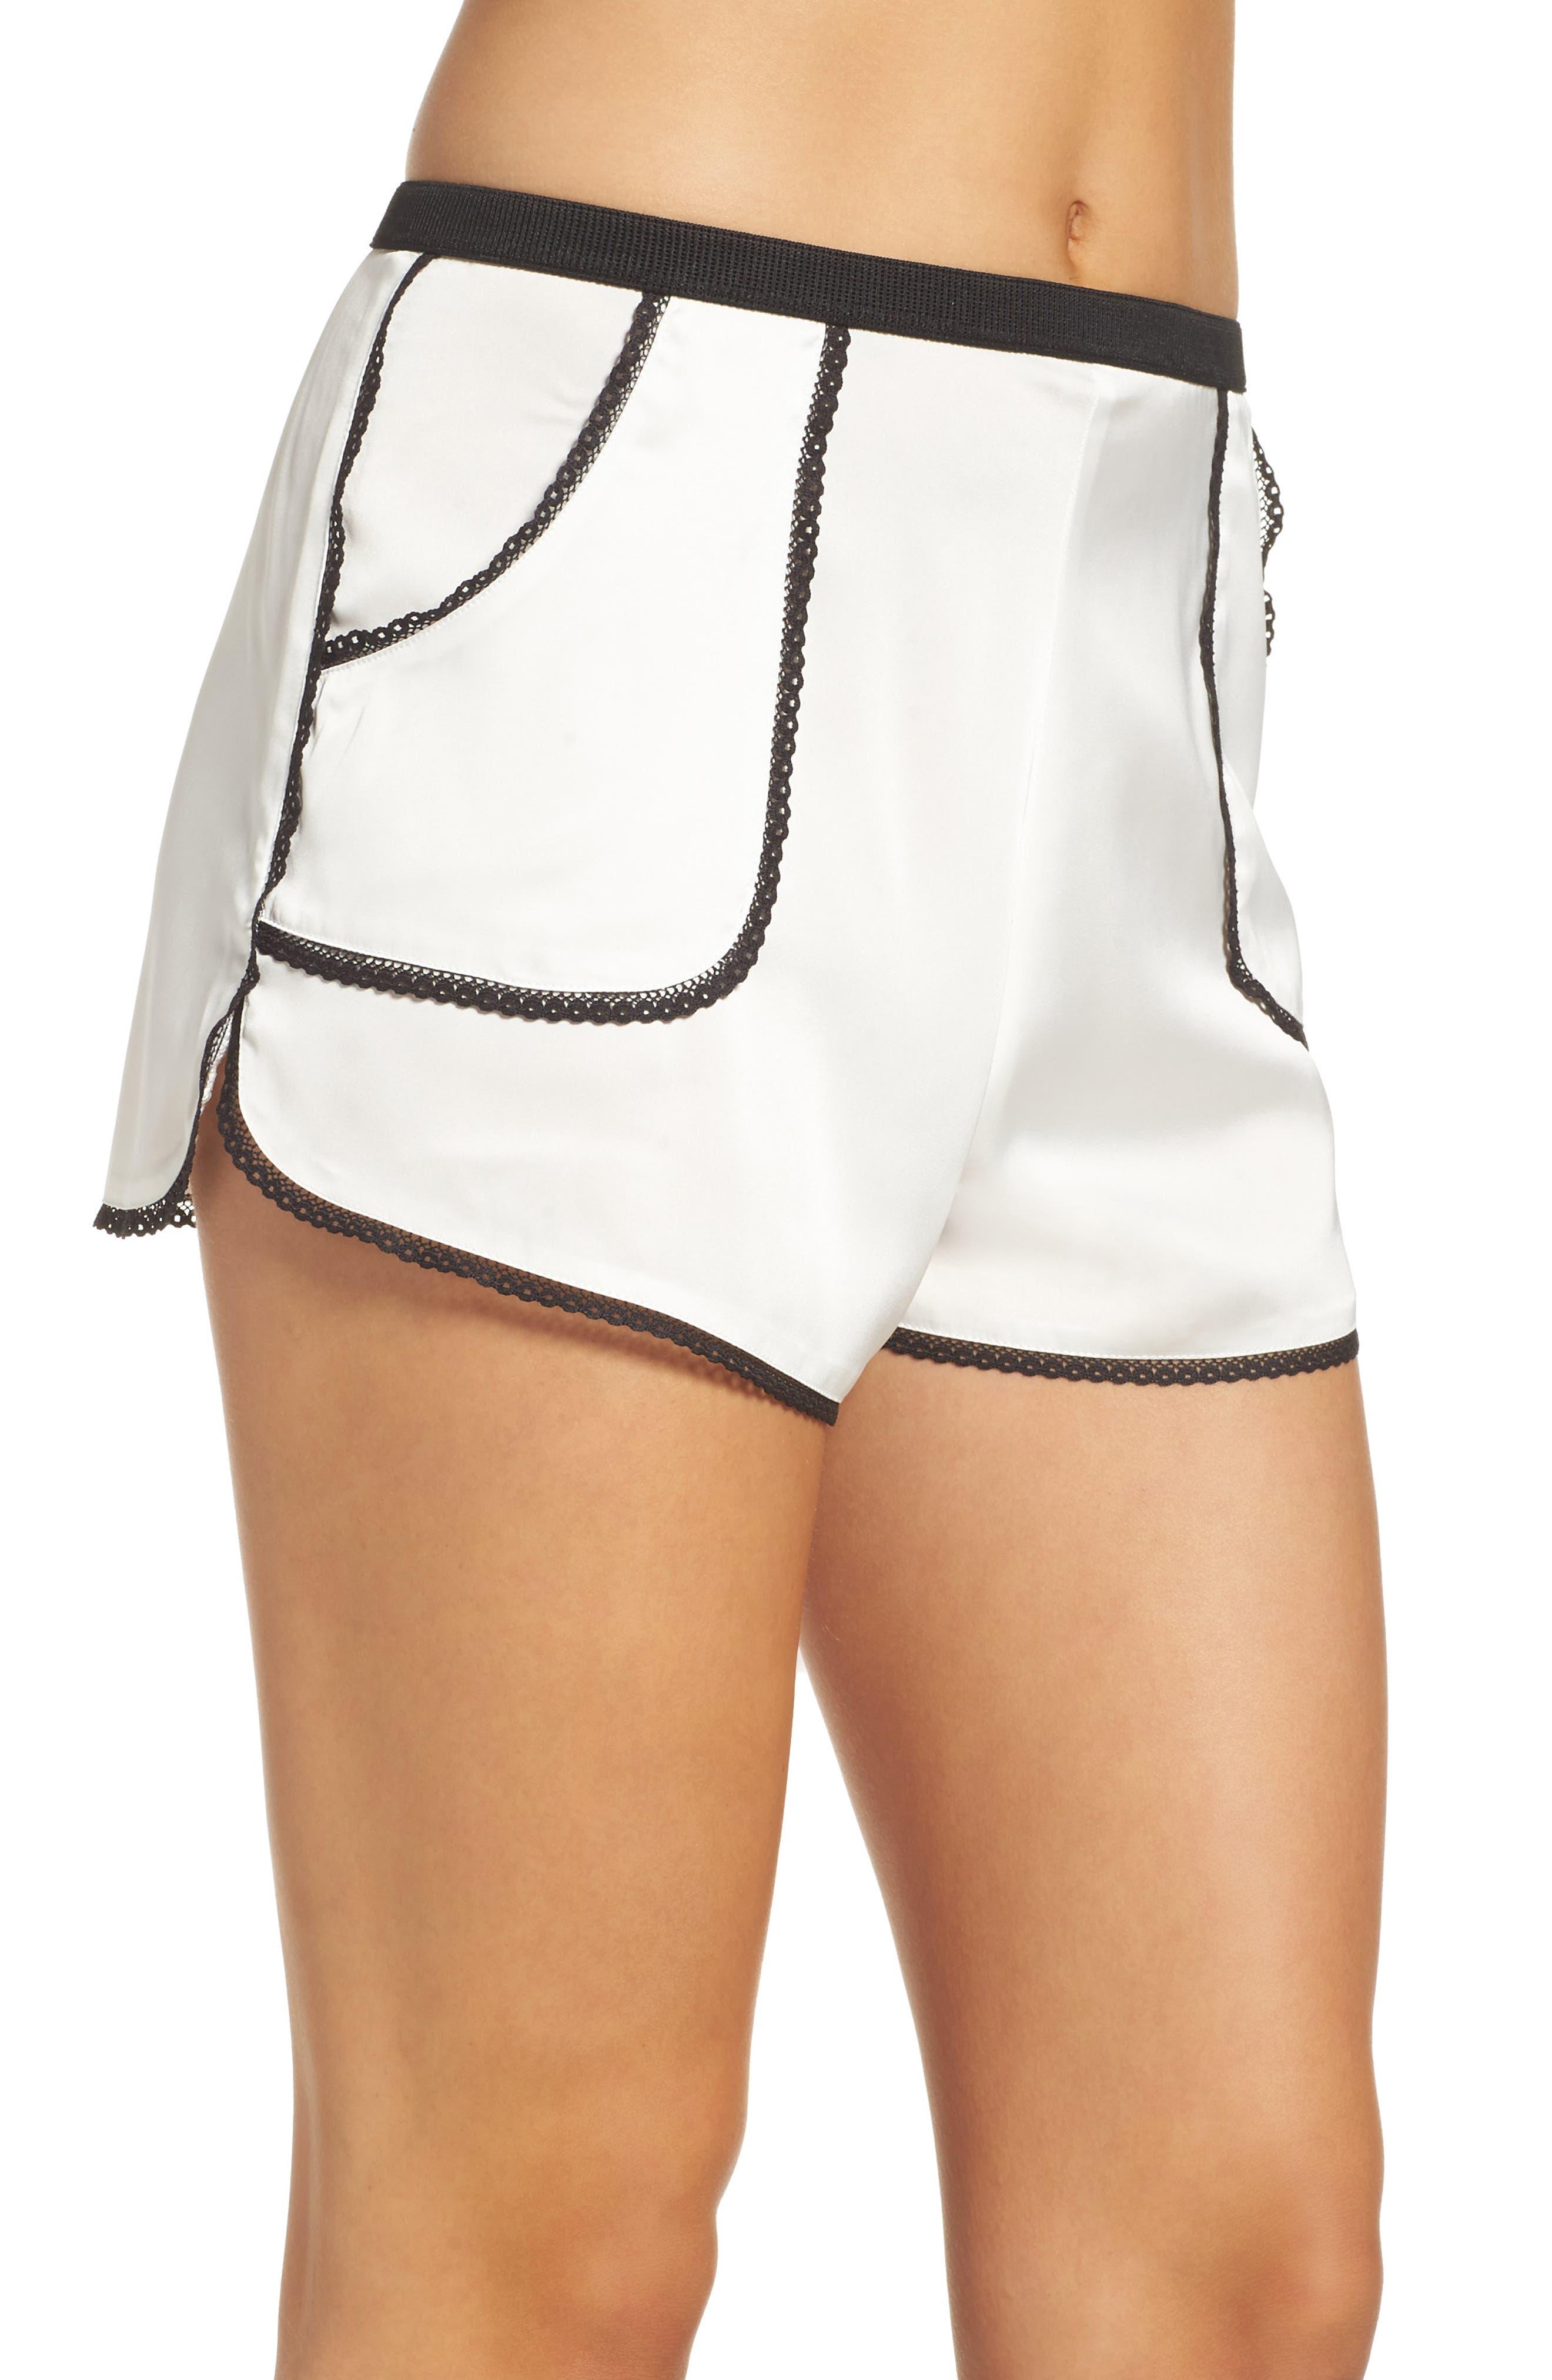 Thistle & Spire Devoe Satin Pajama Shorts,                             Alternate thumbnail 3, color,                             900